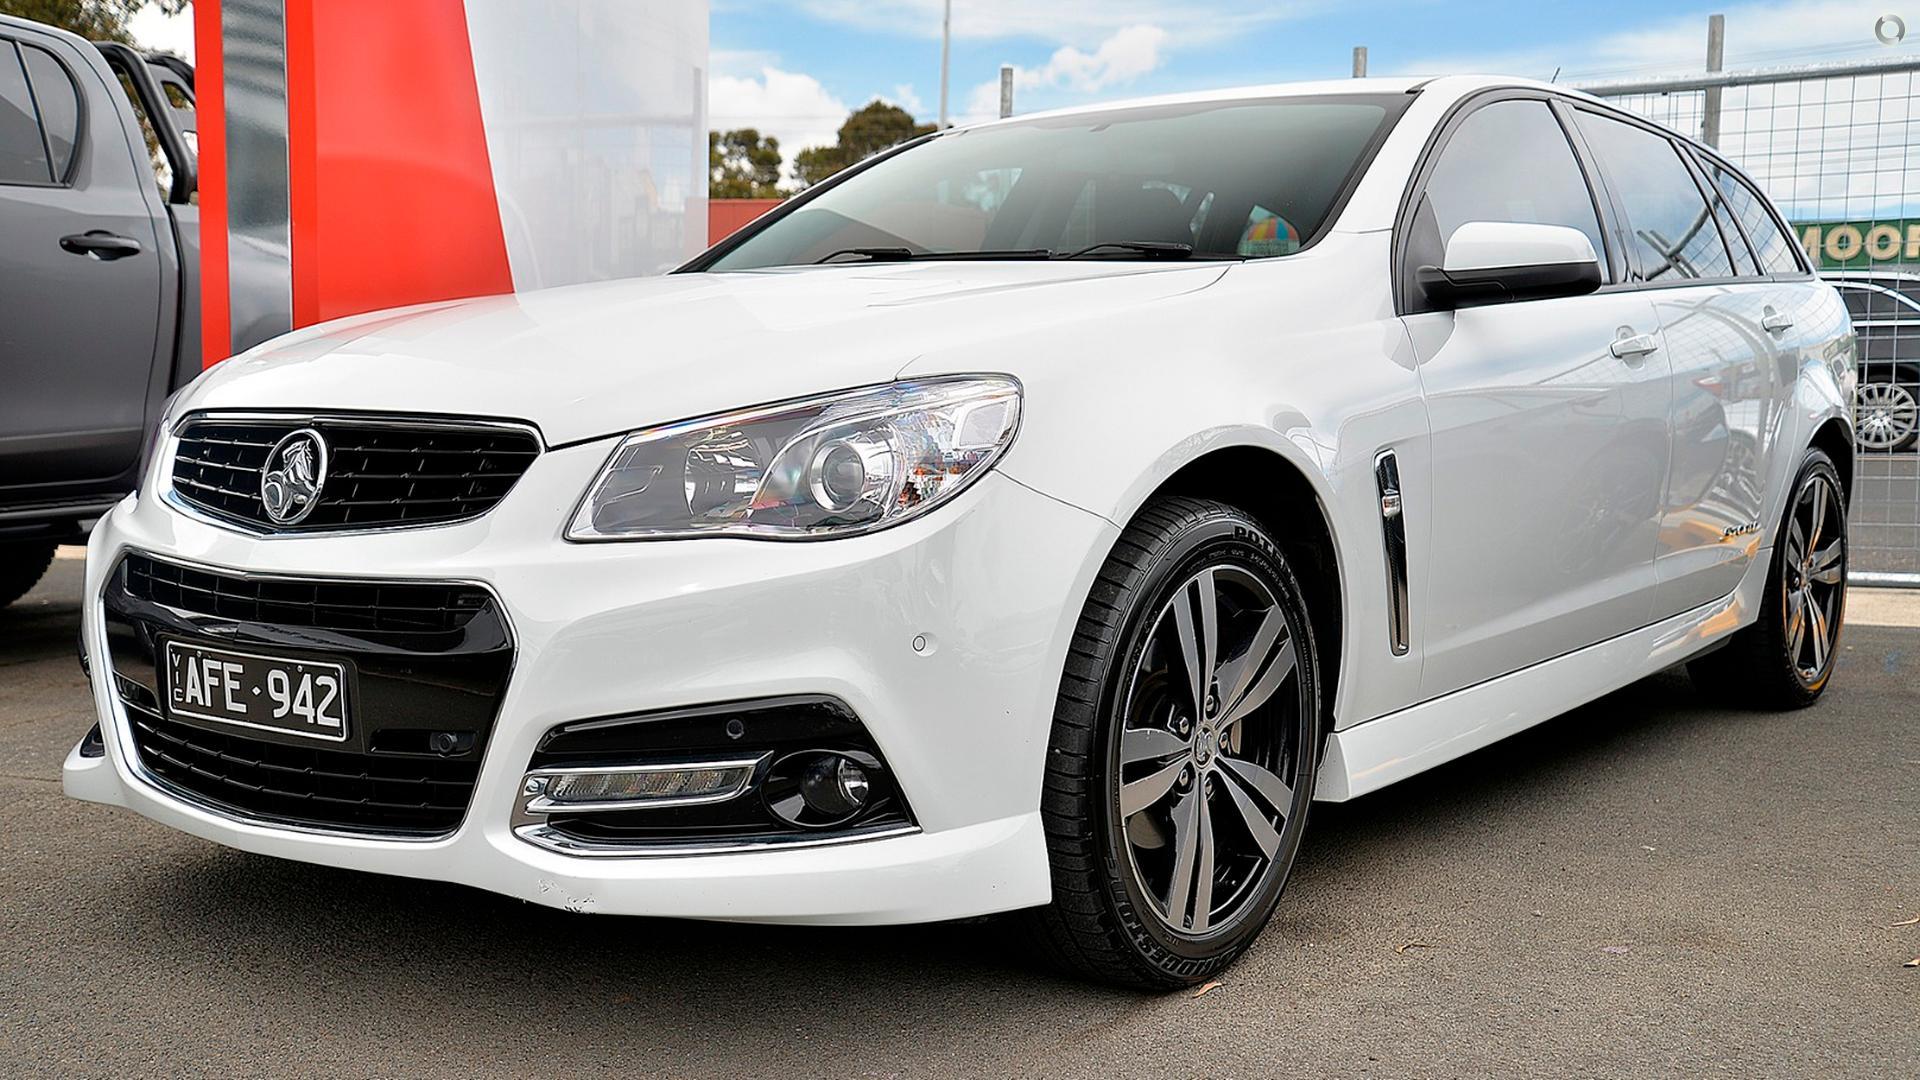 2015 Holden Commodore SV6 Storm VF